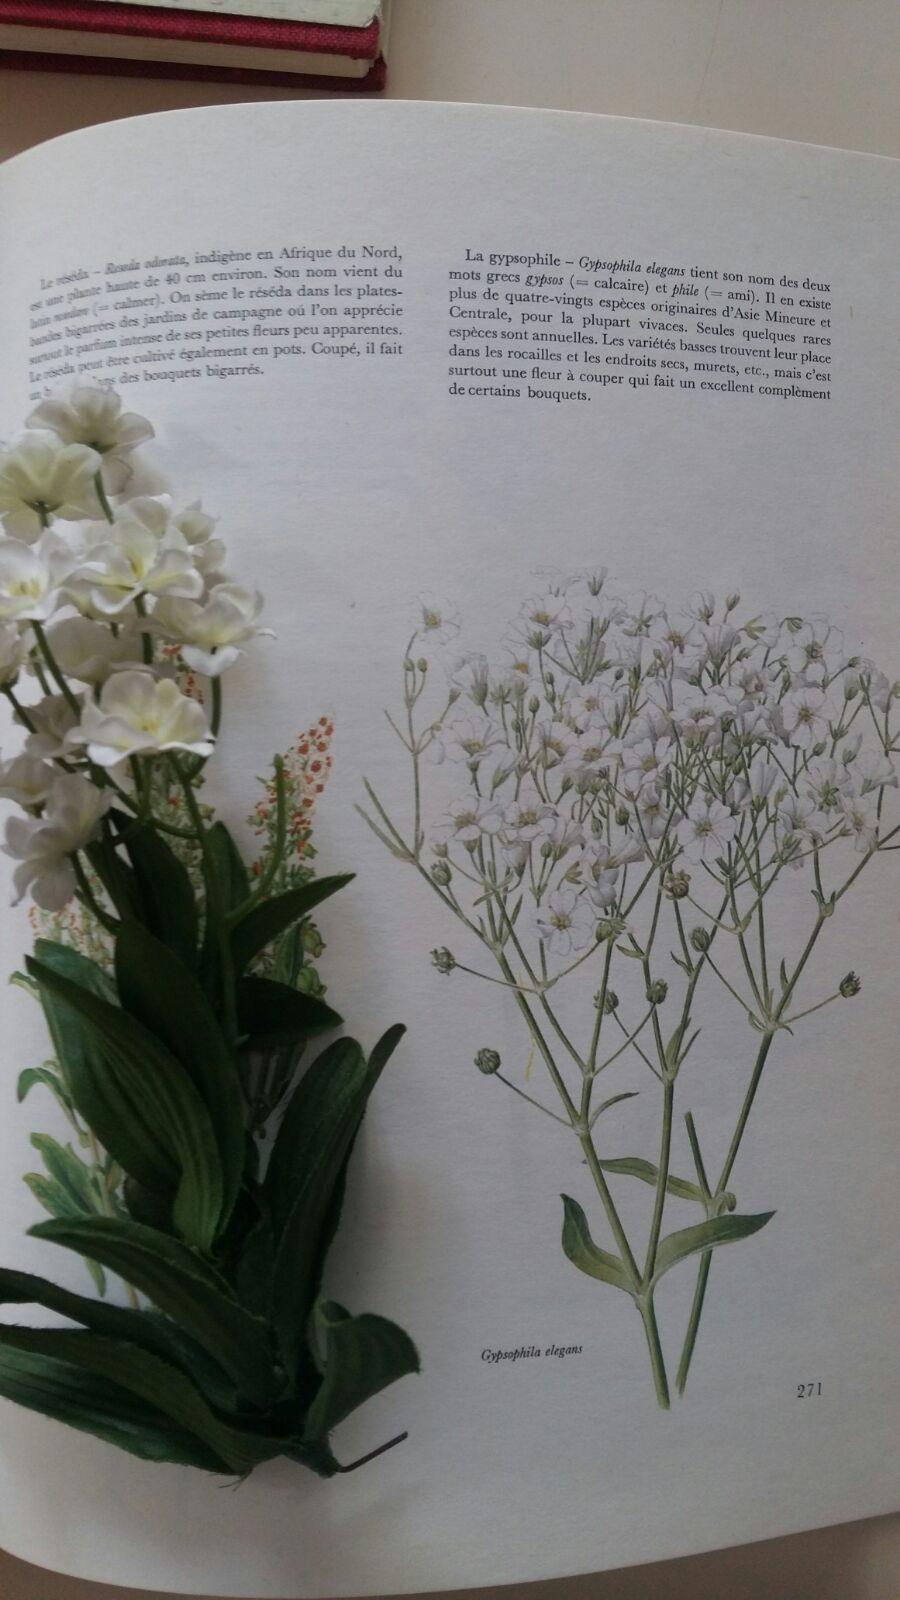 herbier-artificiel6-ingrid-paola-amaro-2016